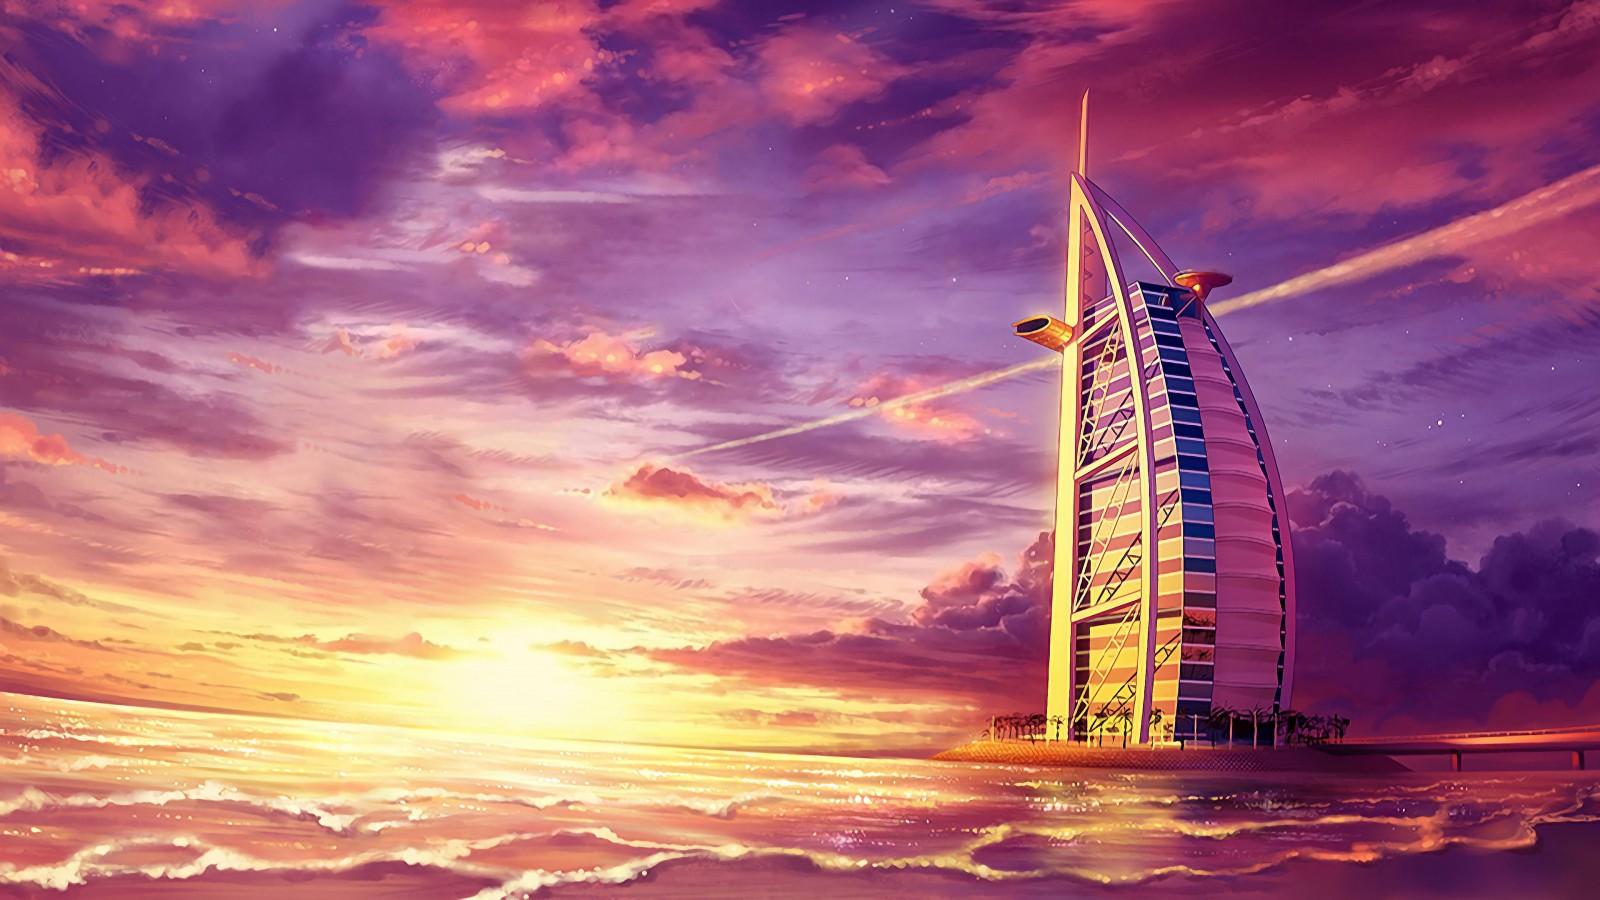 Full Hd Cute Love Wallpaper Burj Al Arab At Sunset Paint 4k Wallpapers Hd Wallpapers